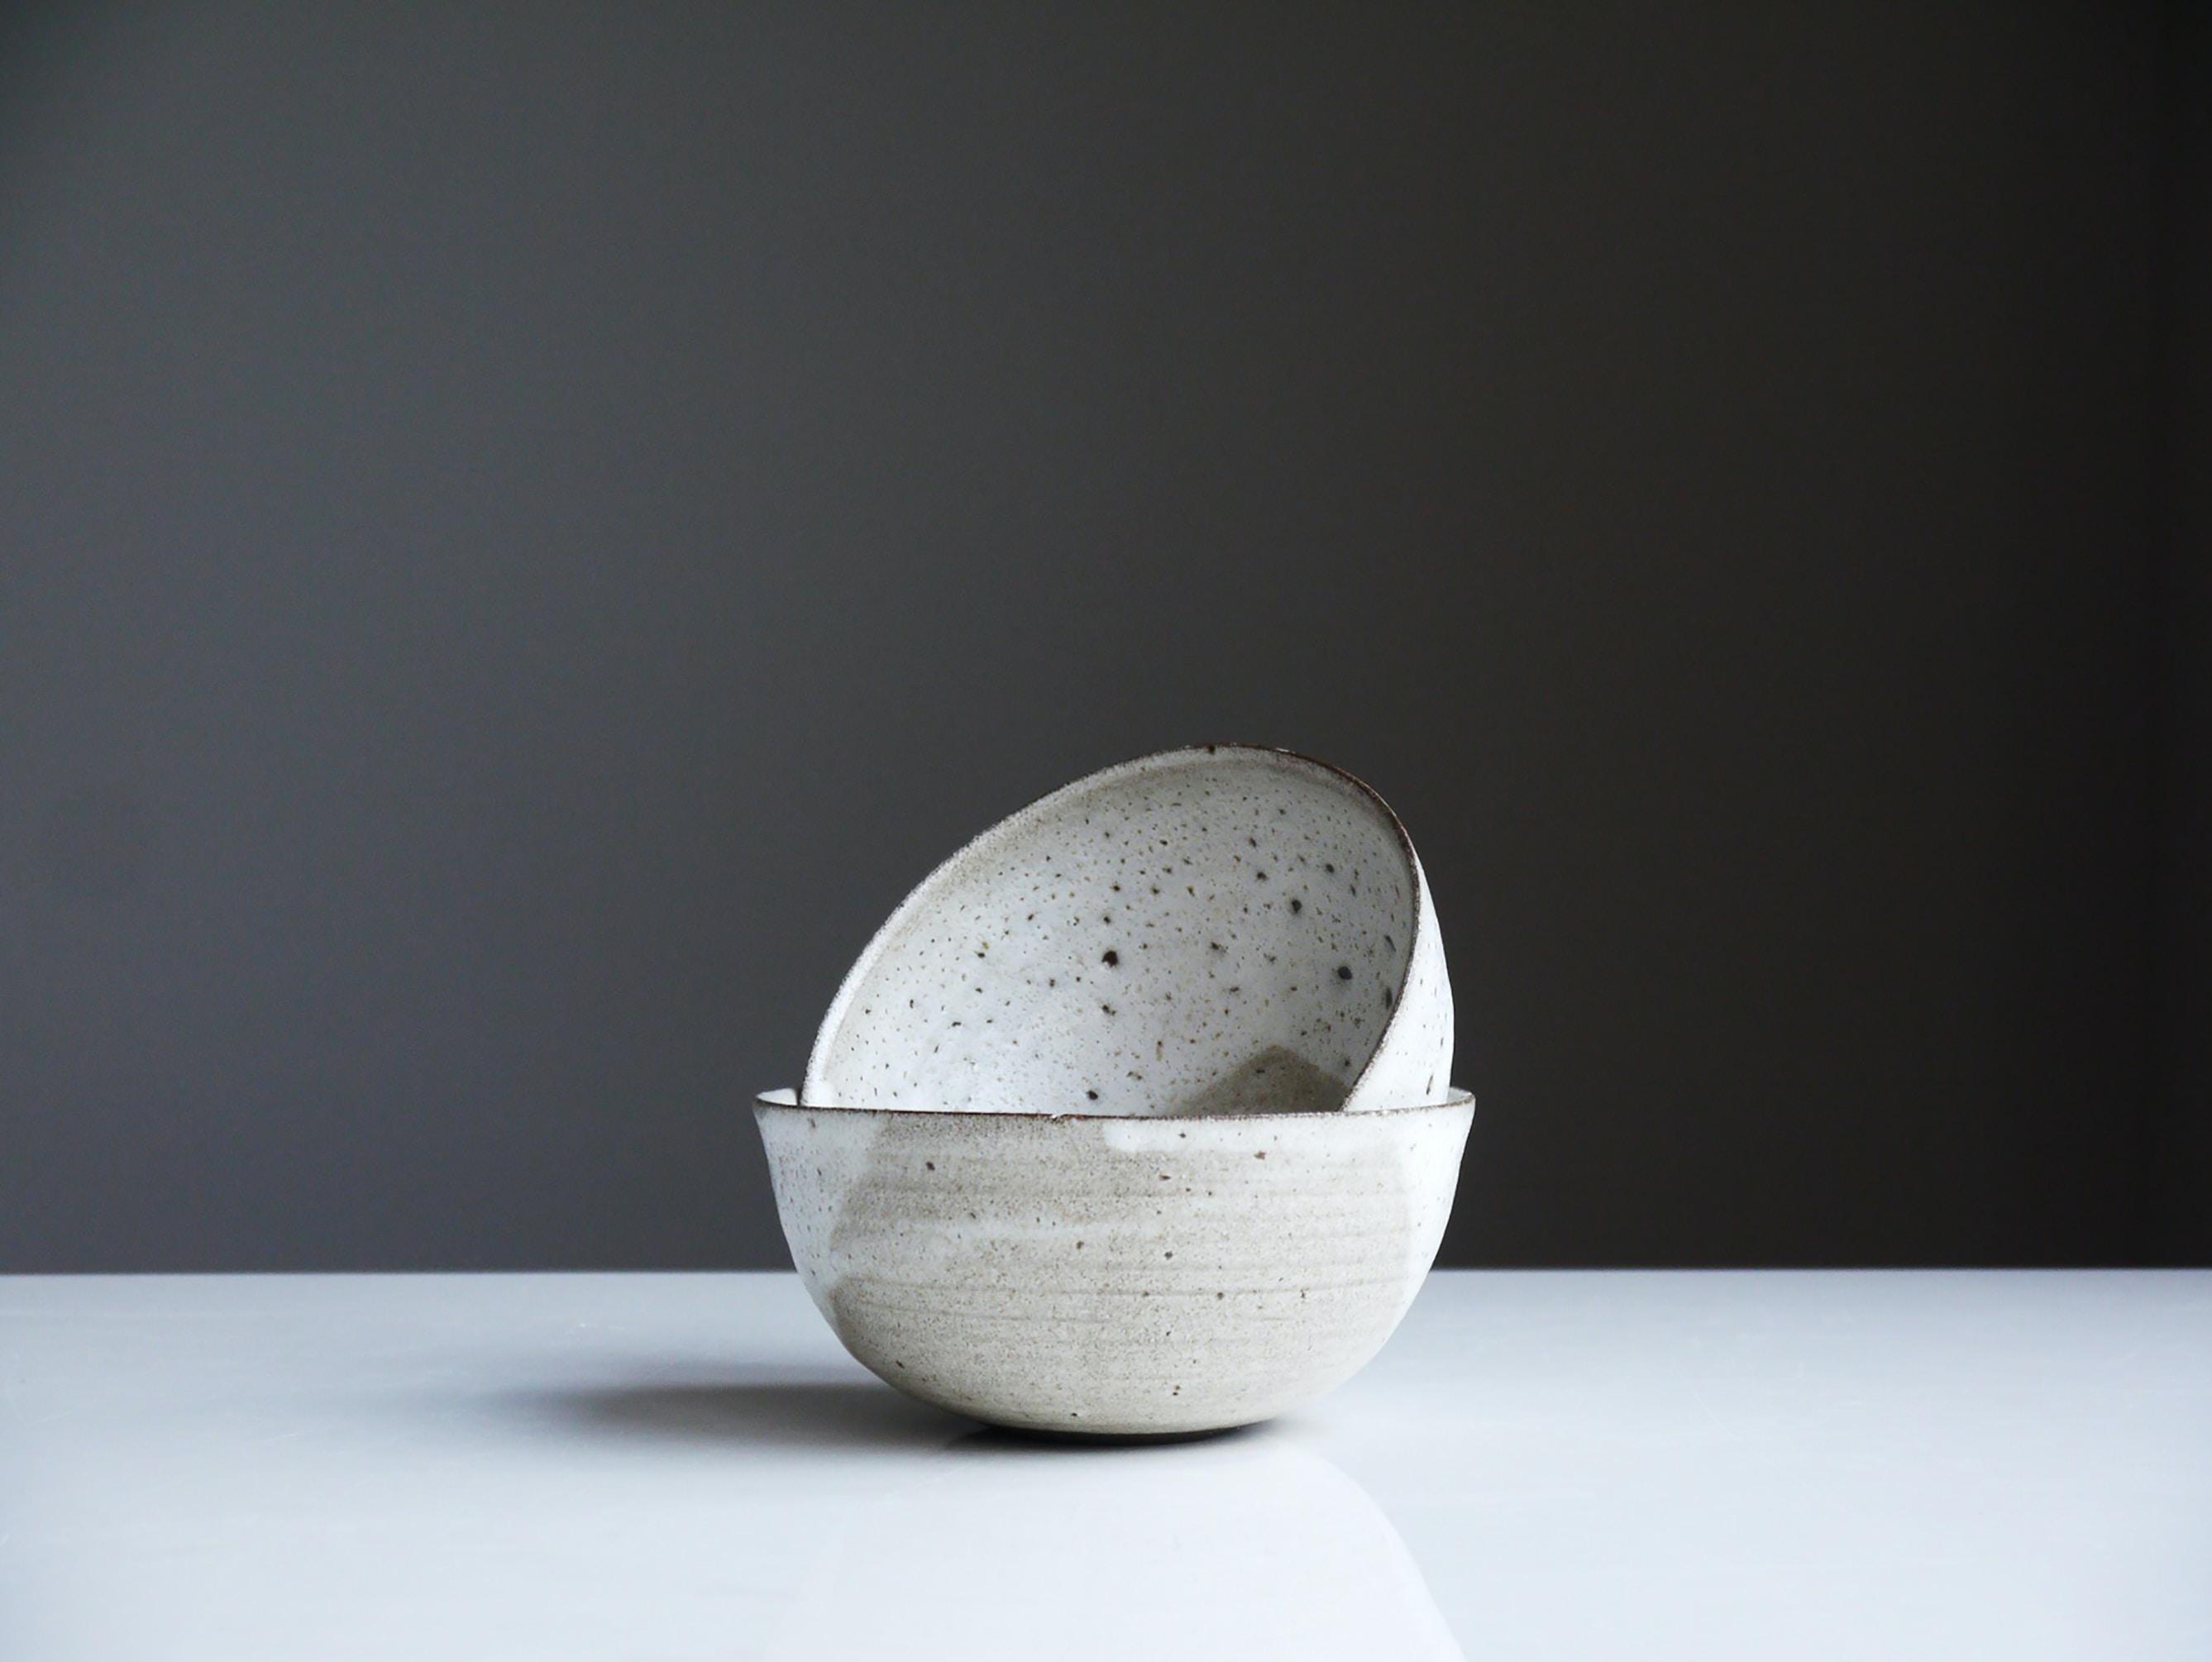 two white ceramic bowls